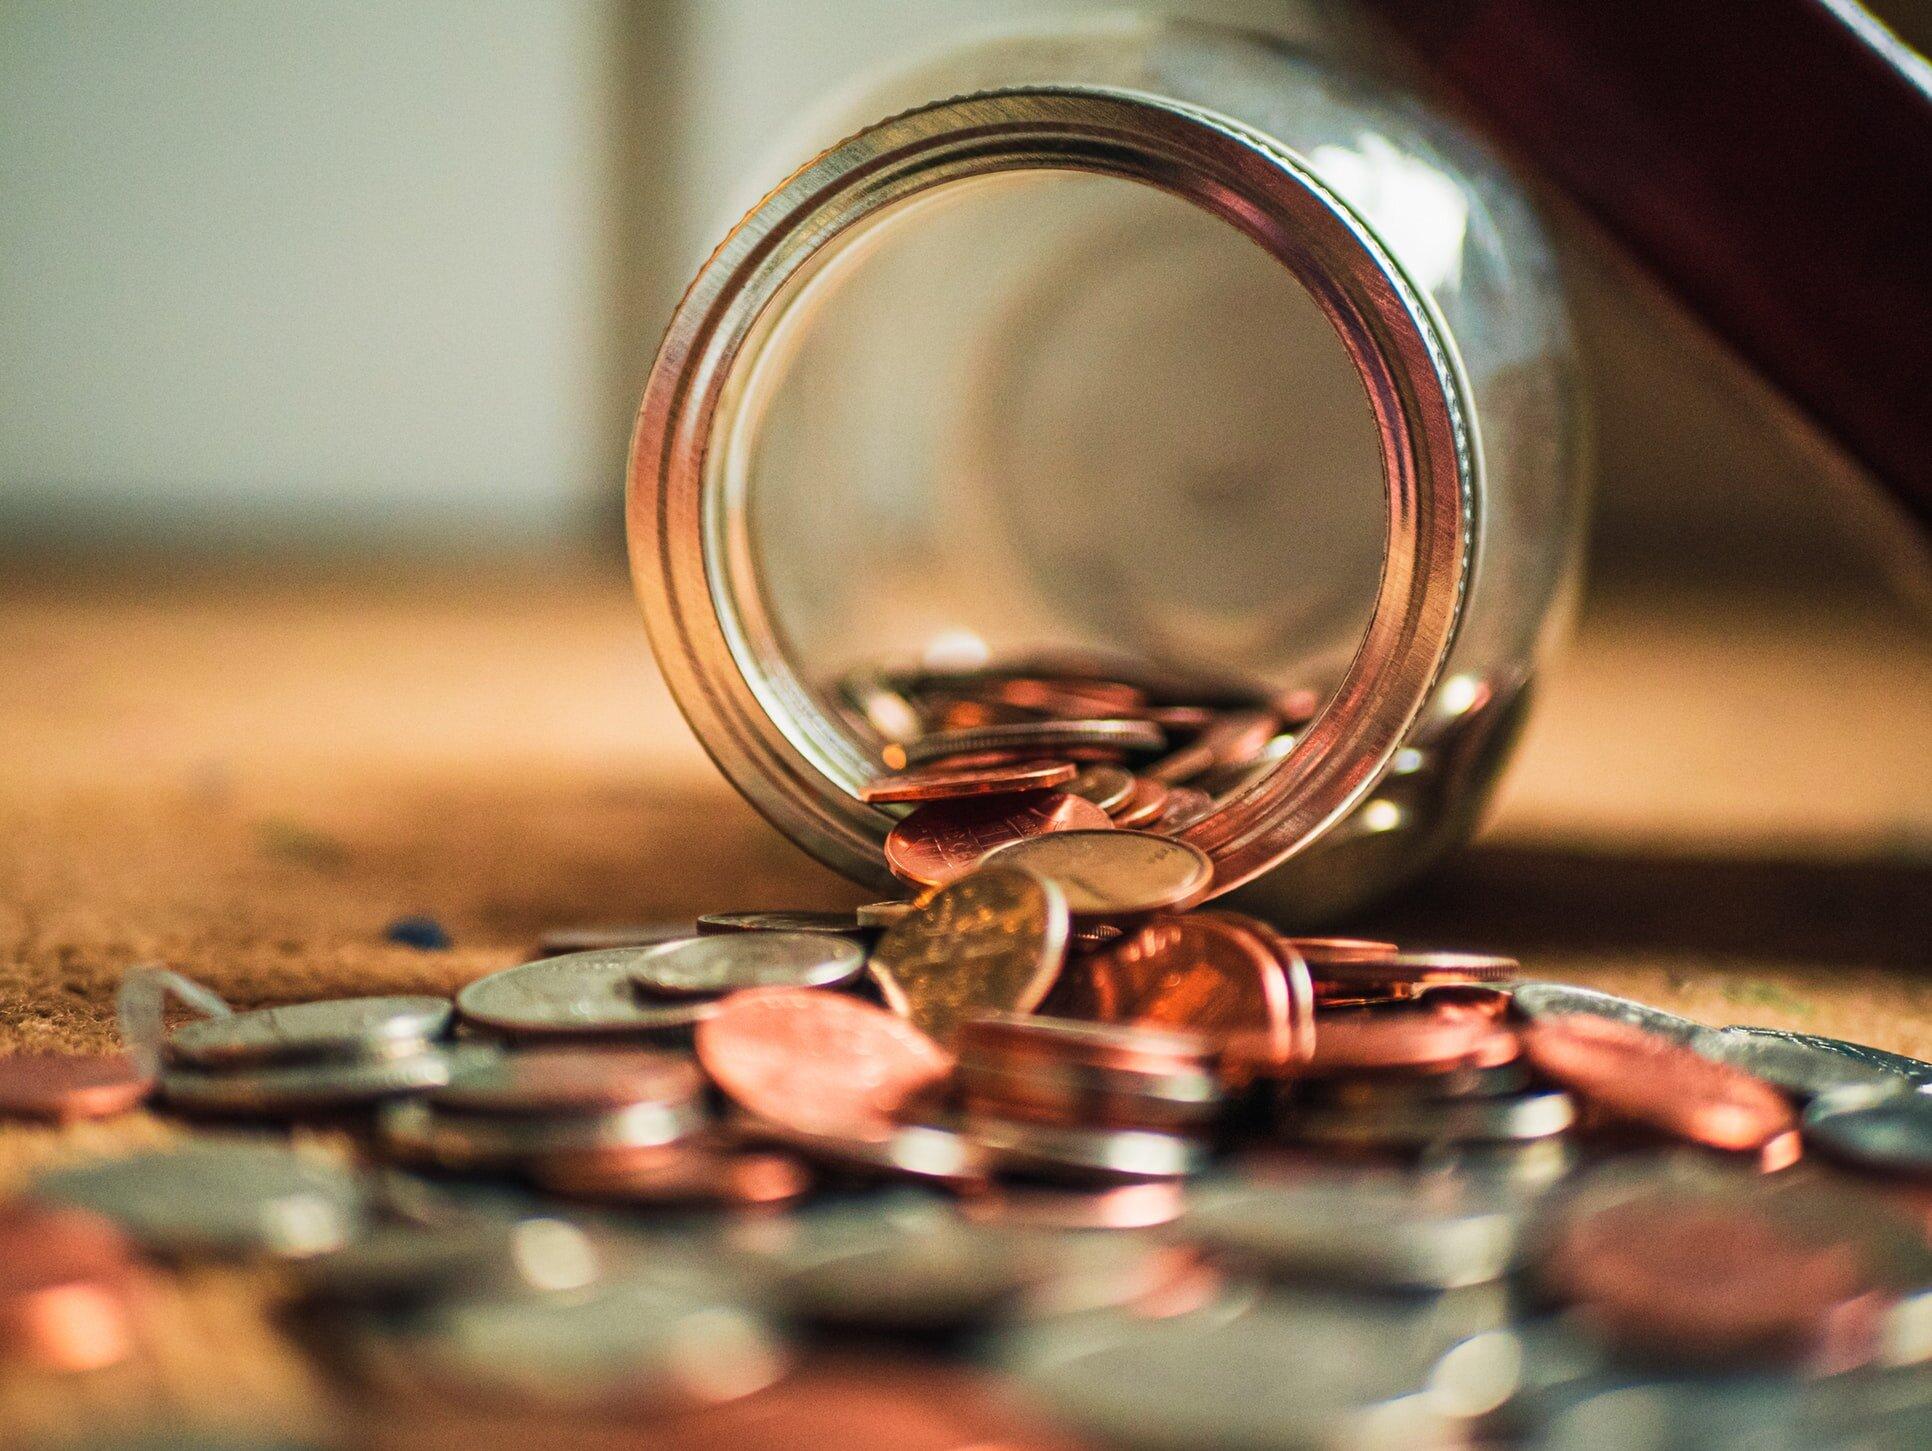 financialhabits-moneyhabits-wealthmanagement-buildingwealth.jpg